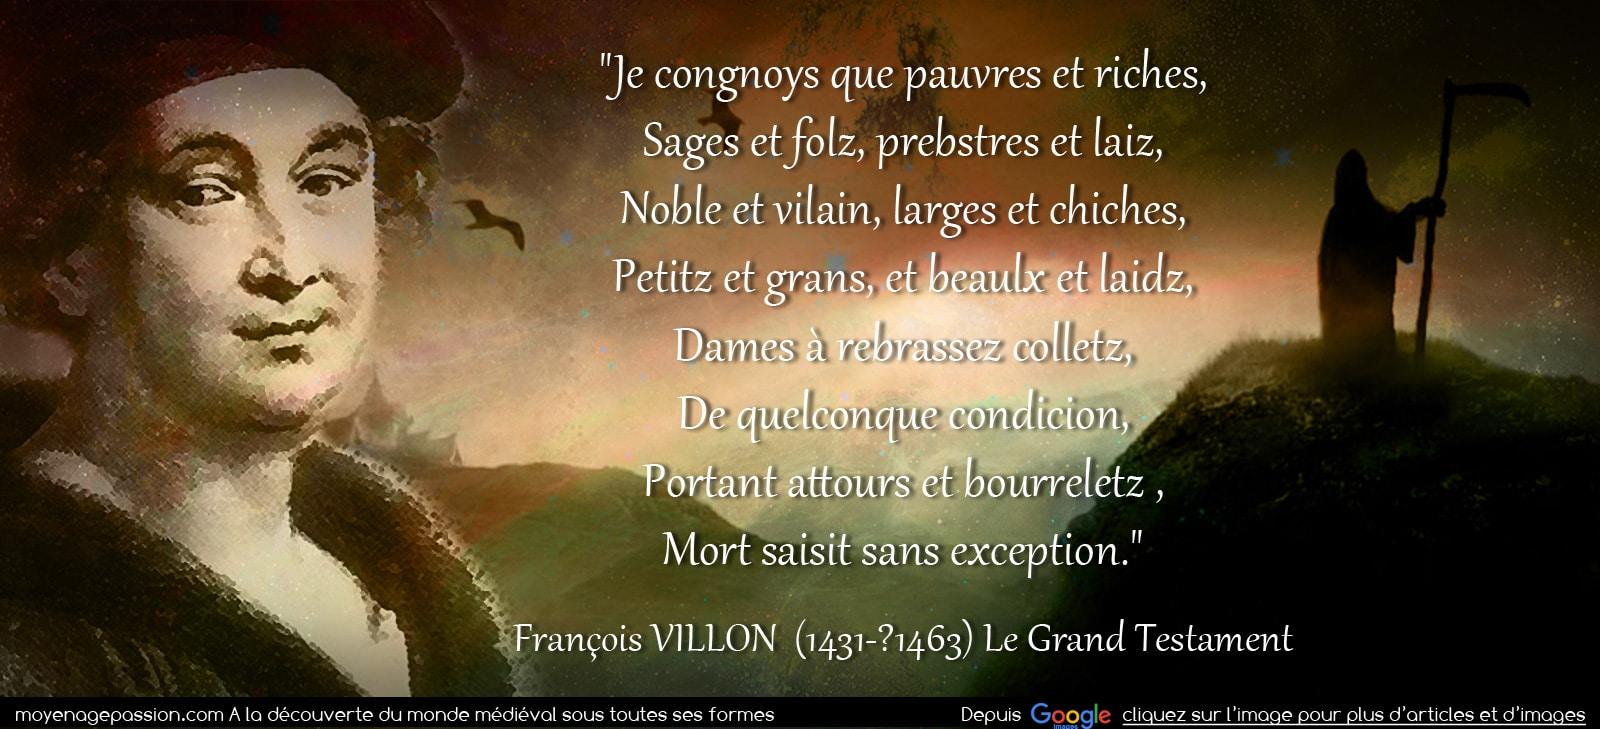 villon_poesie_medievale_grand_testament_mort_moyen-age_tardif